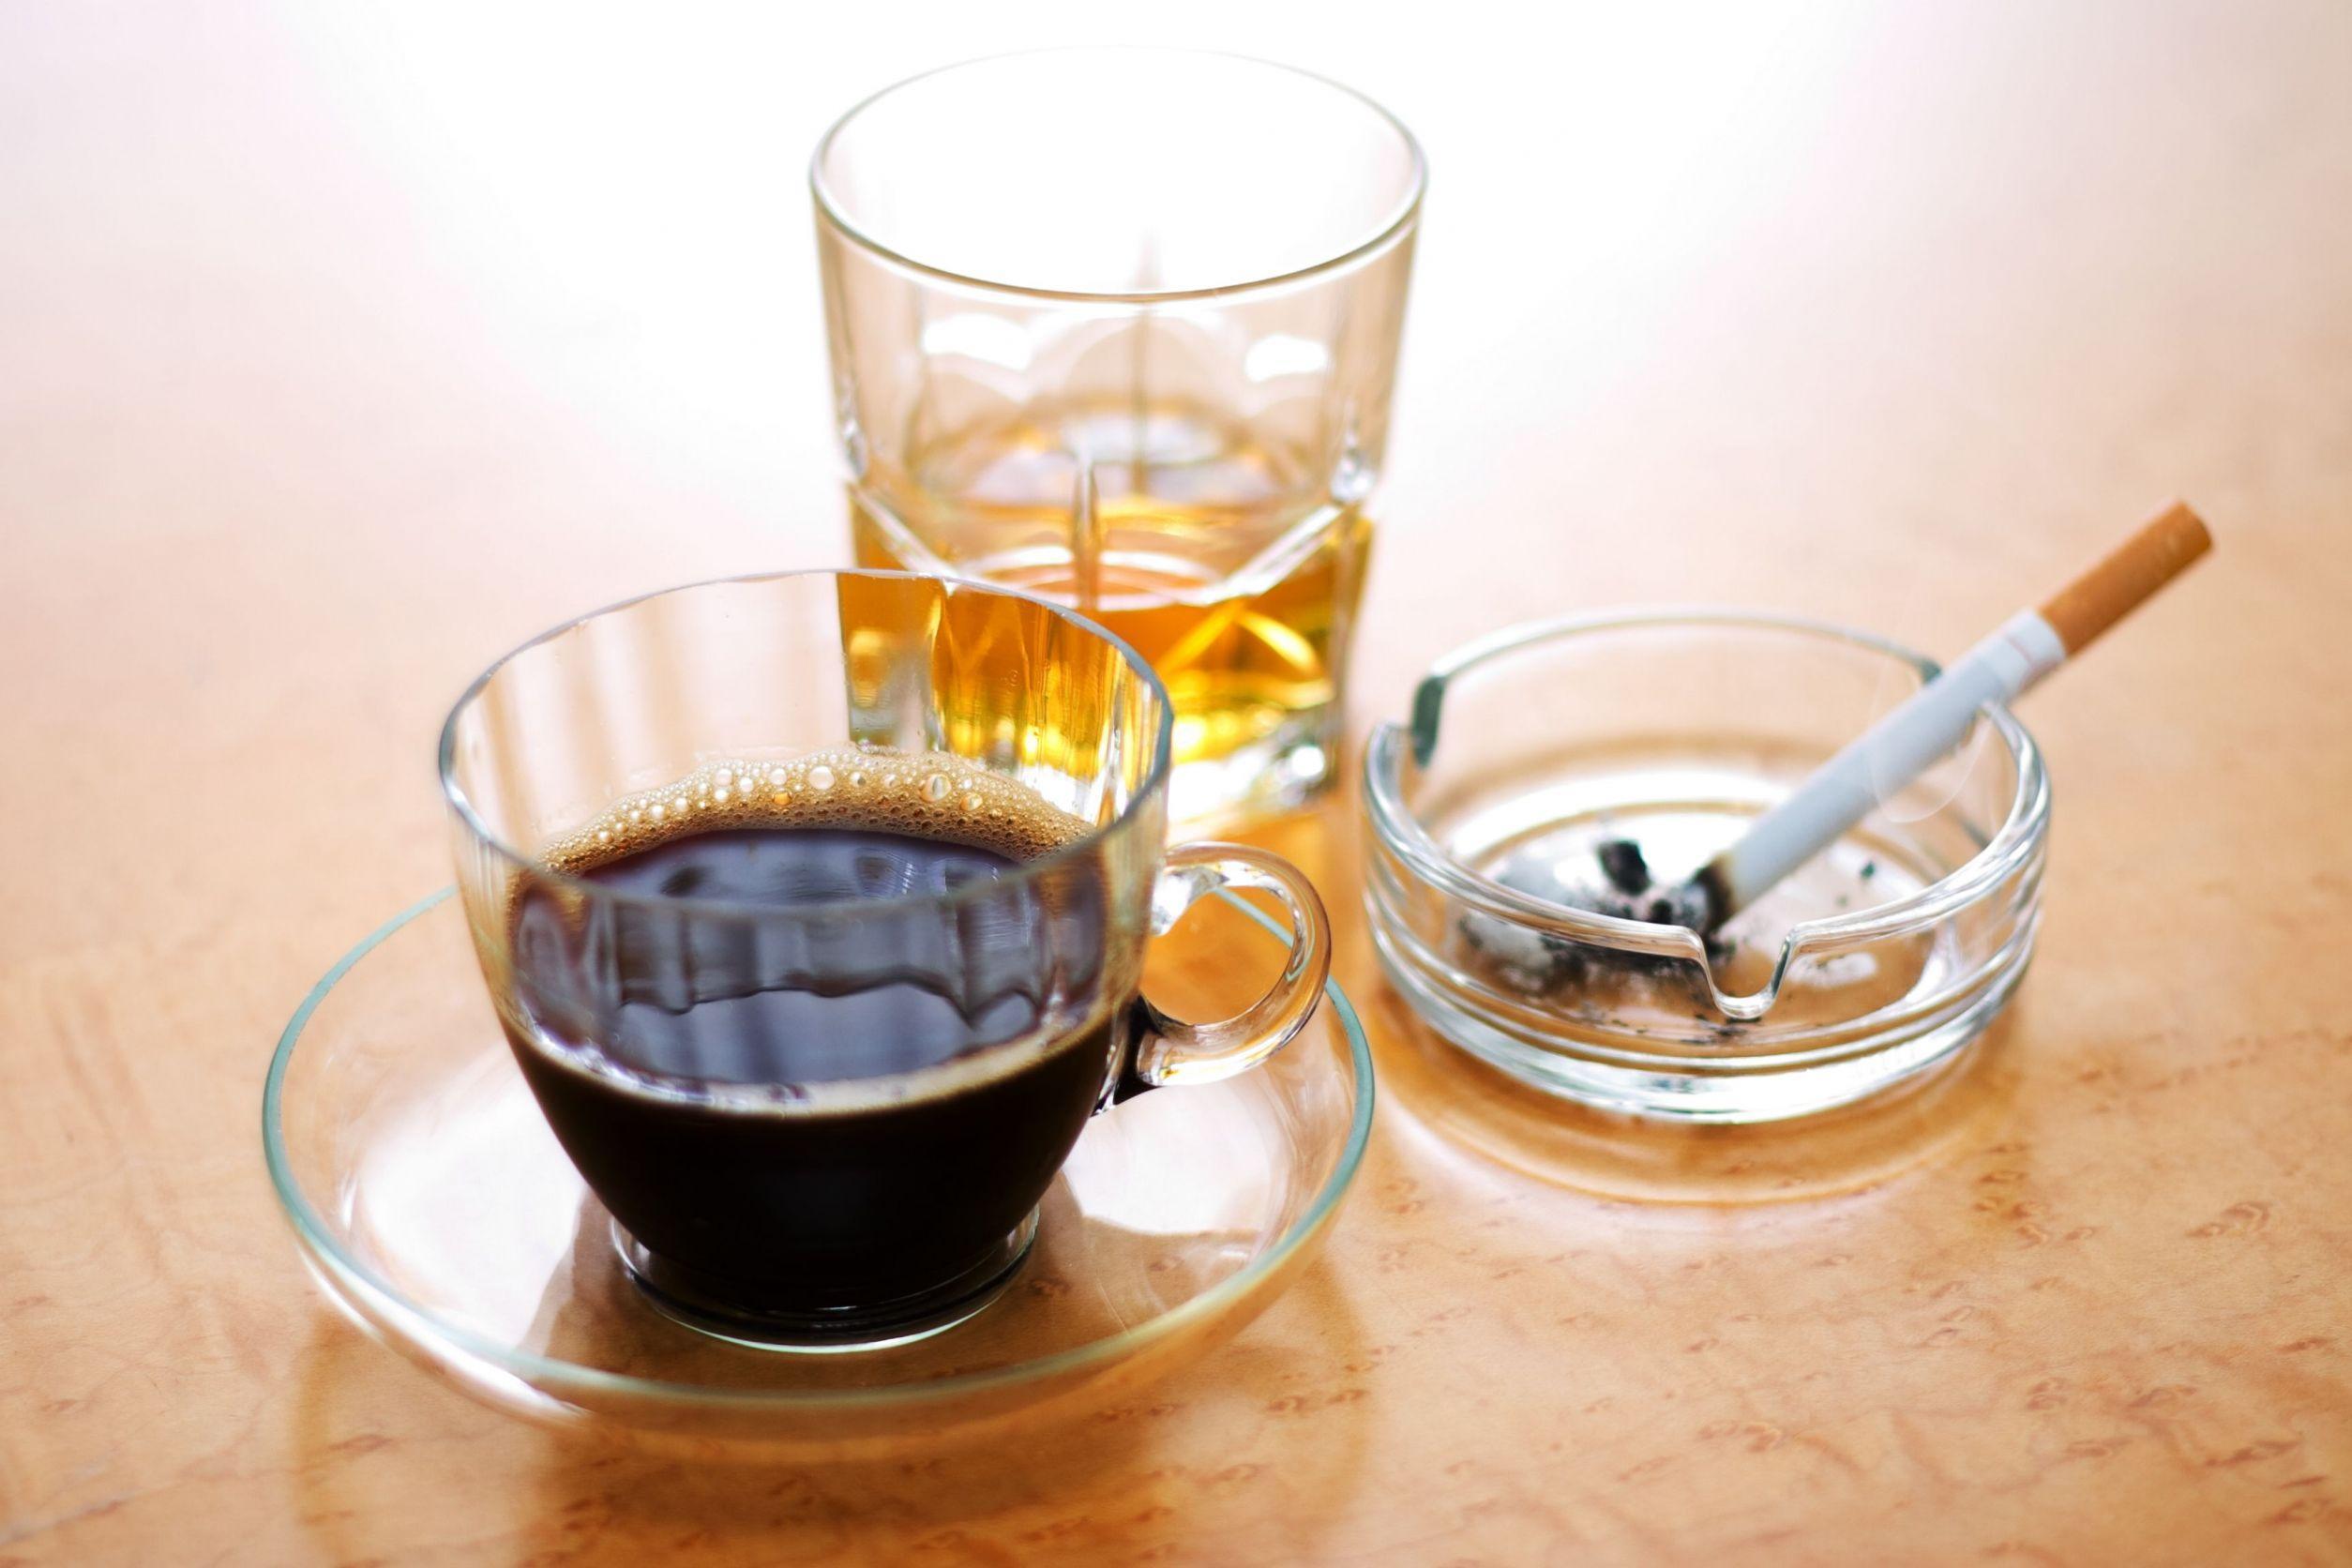 Alcohol & tobacco: